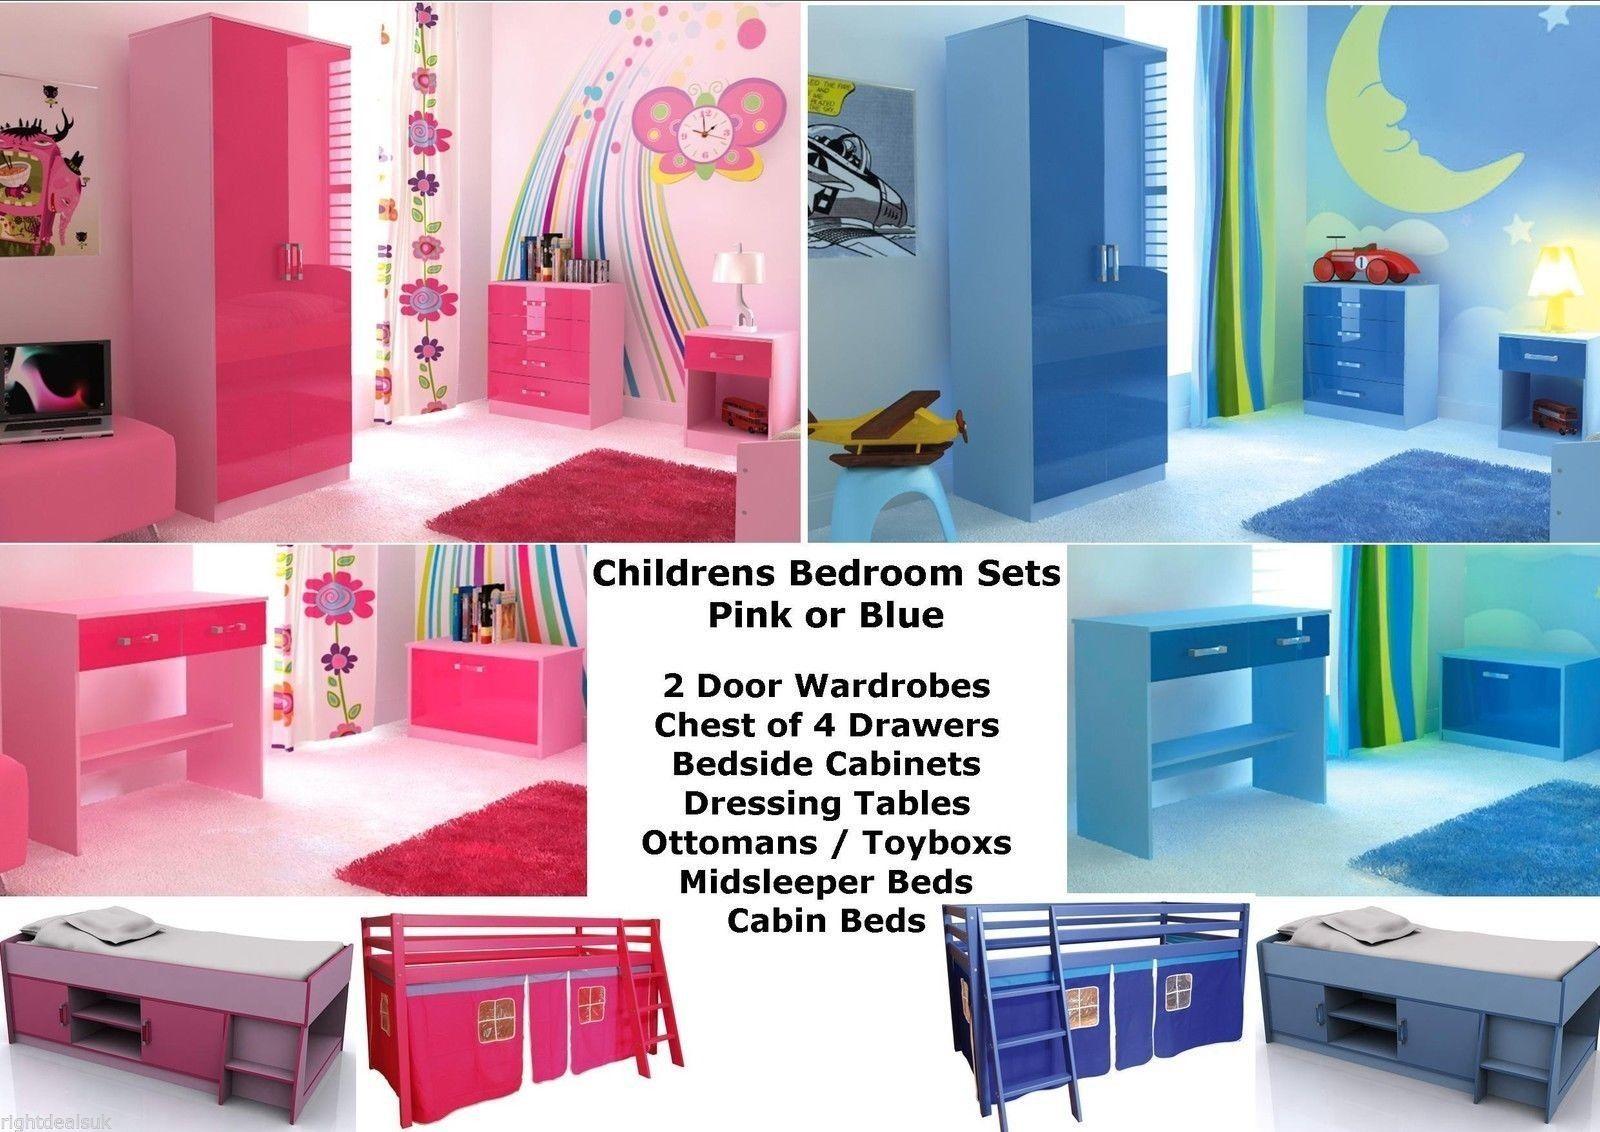 Pink Or Blue Two Tone Ultra High Gloss Girls Boys Caspian Bedroom Furniture Sets Ebay Bedroom Furniture Sets Pink Blue High Gloss